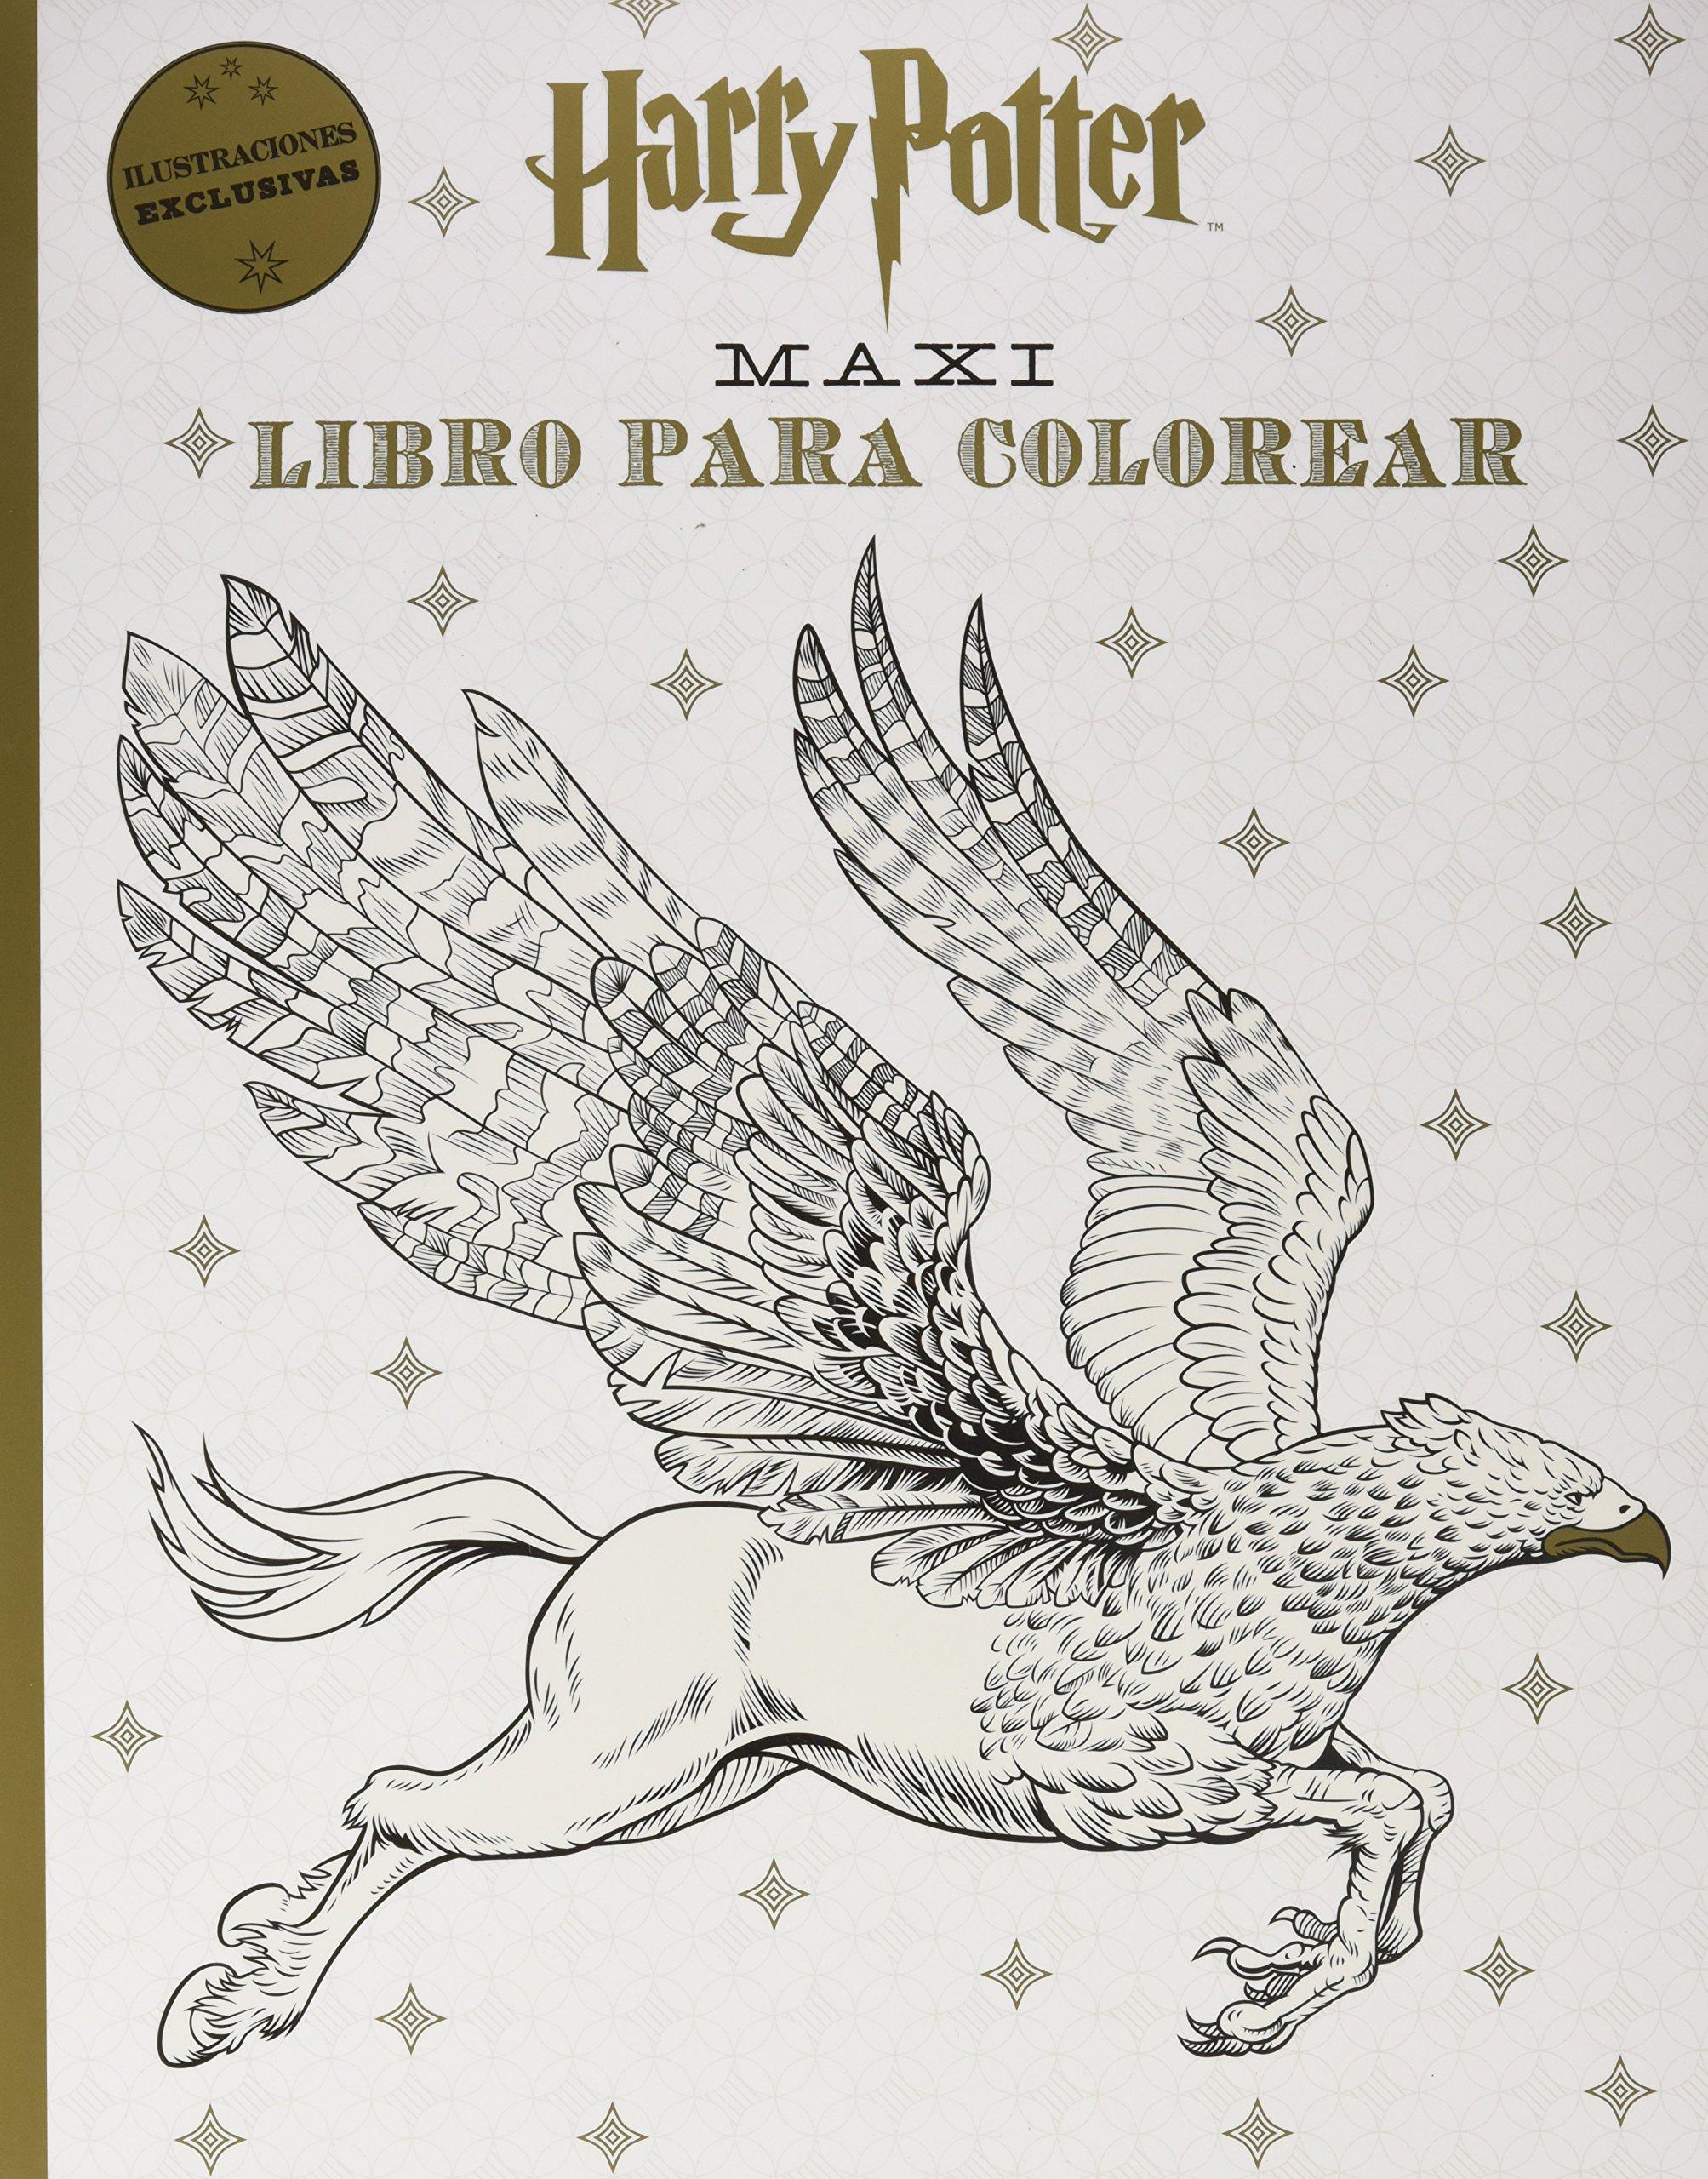 Harry Potter Maxi libro para colorear: Amazon.es: Vv.Aa.: Libros